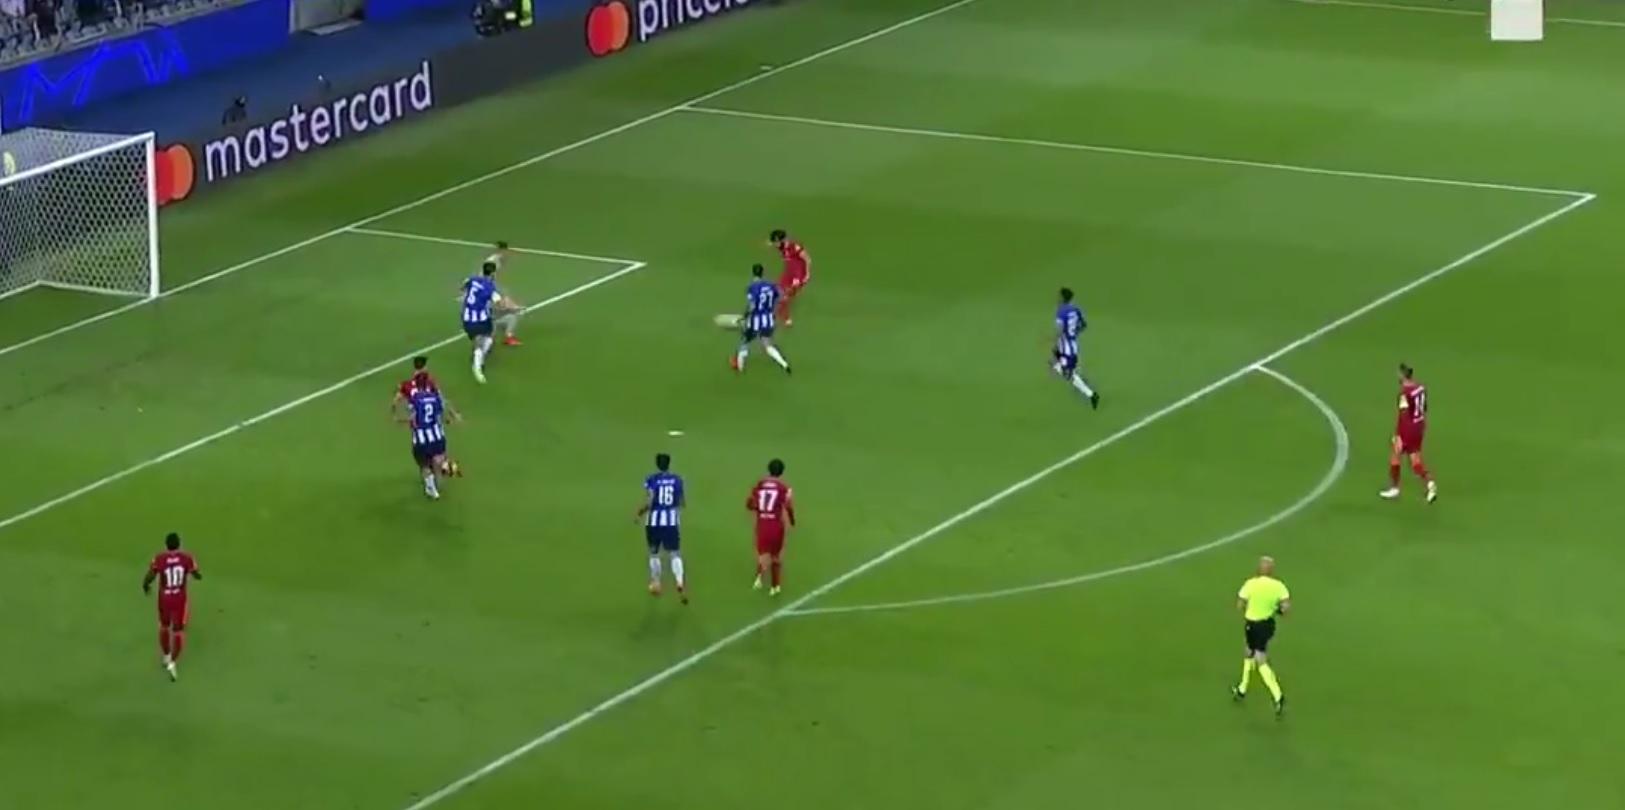 (Video) Salah bags brace for Liverpool as Jones makes light work of Porto